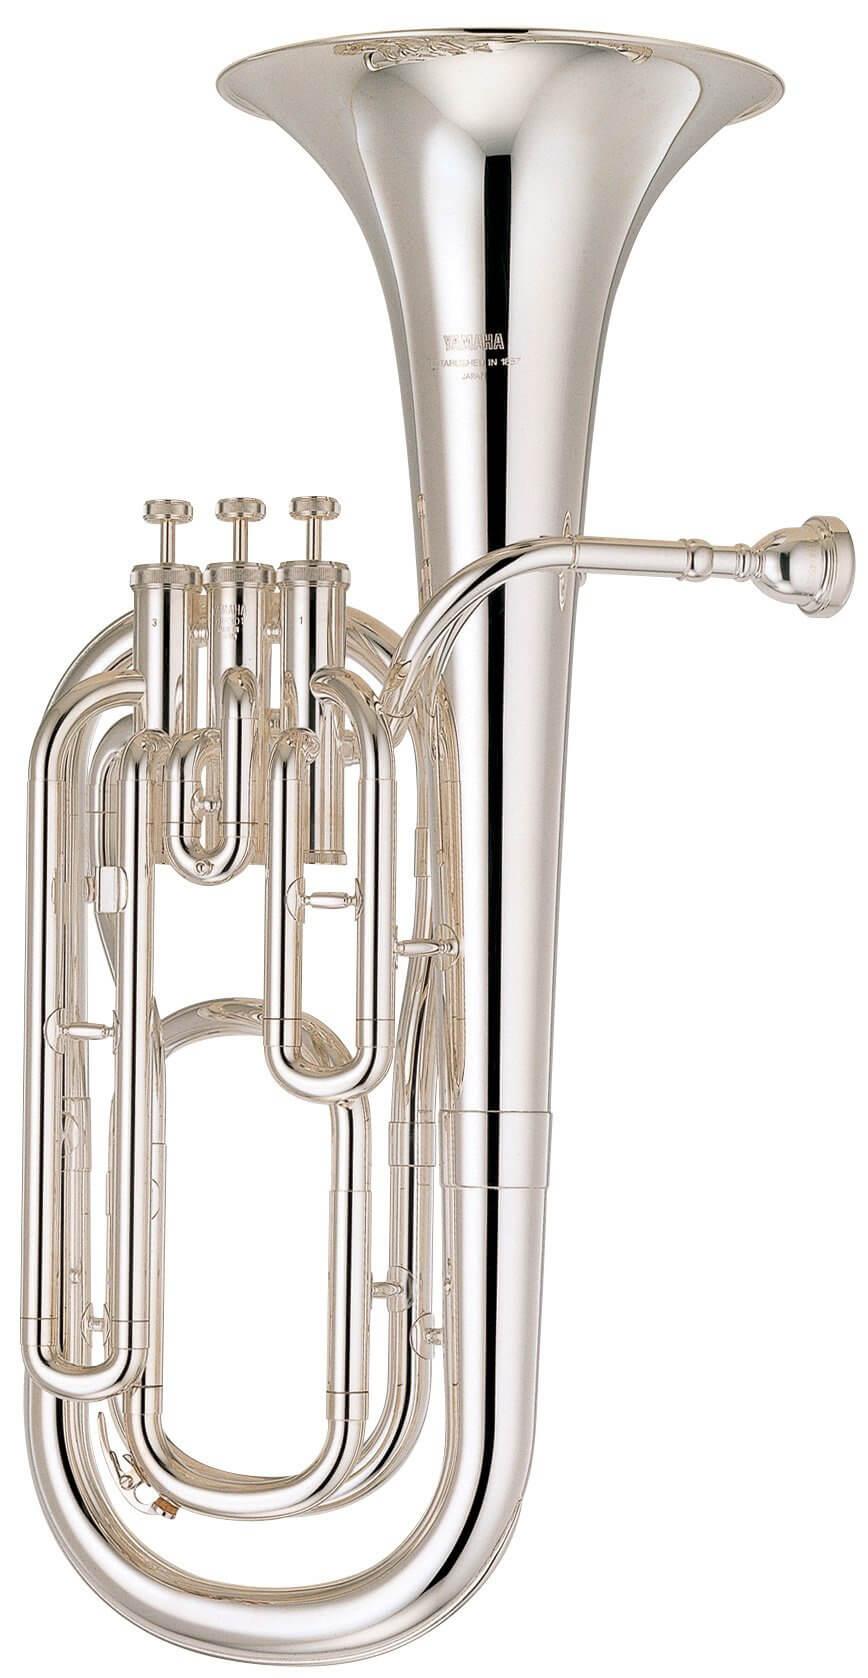 Baritono Yamaha Ybh-301S